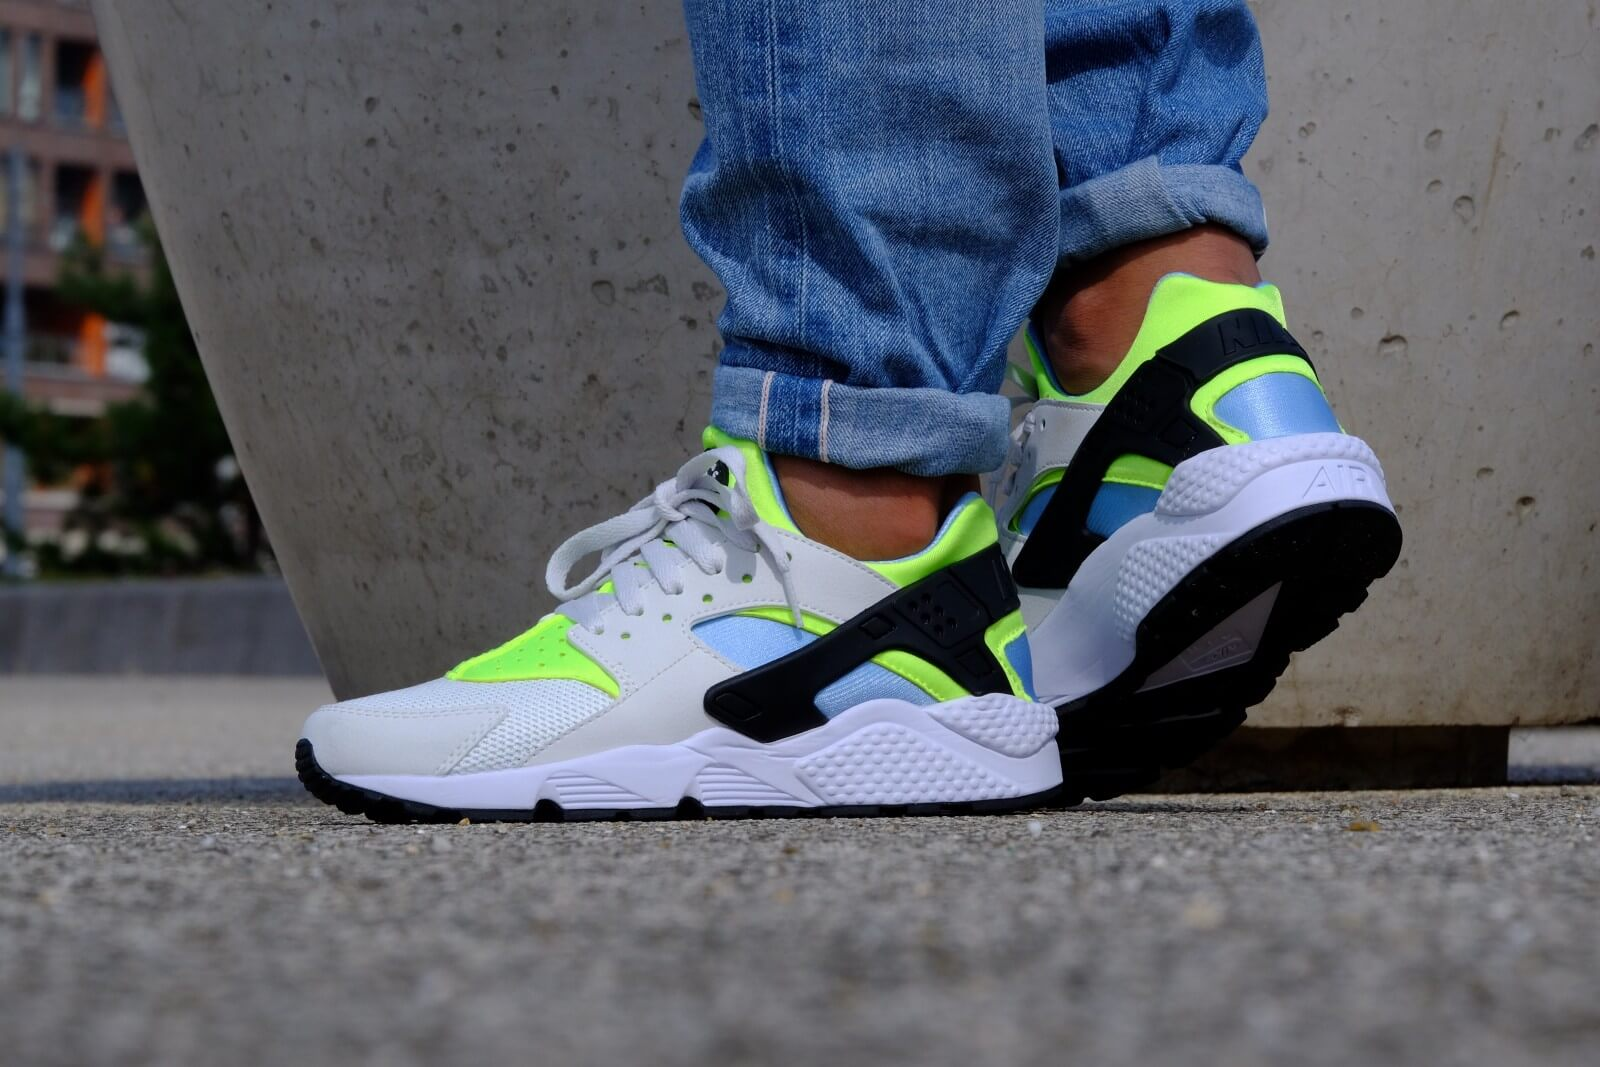 Nike Air Huarache Off White/ Barely Volt